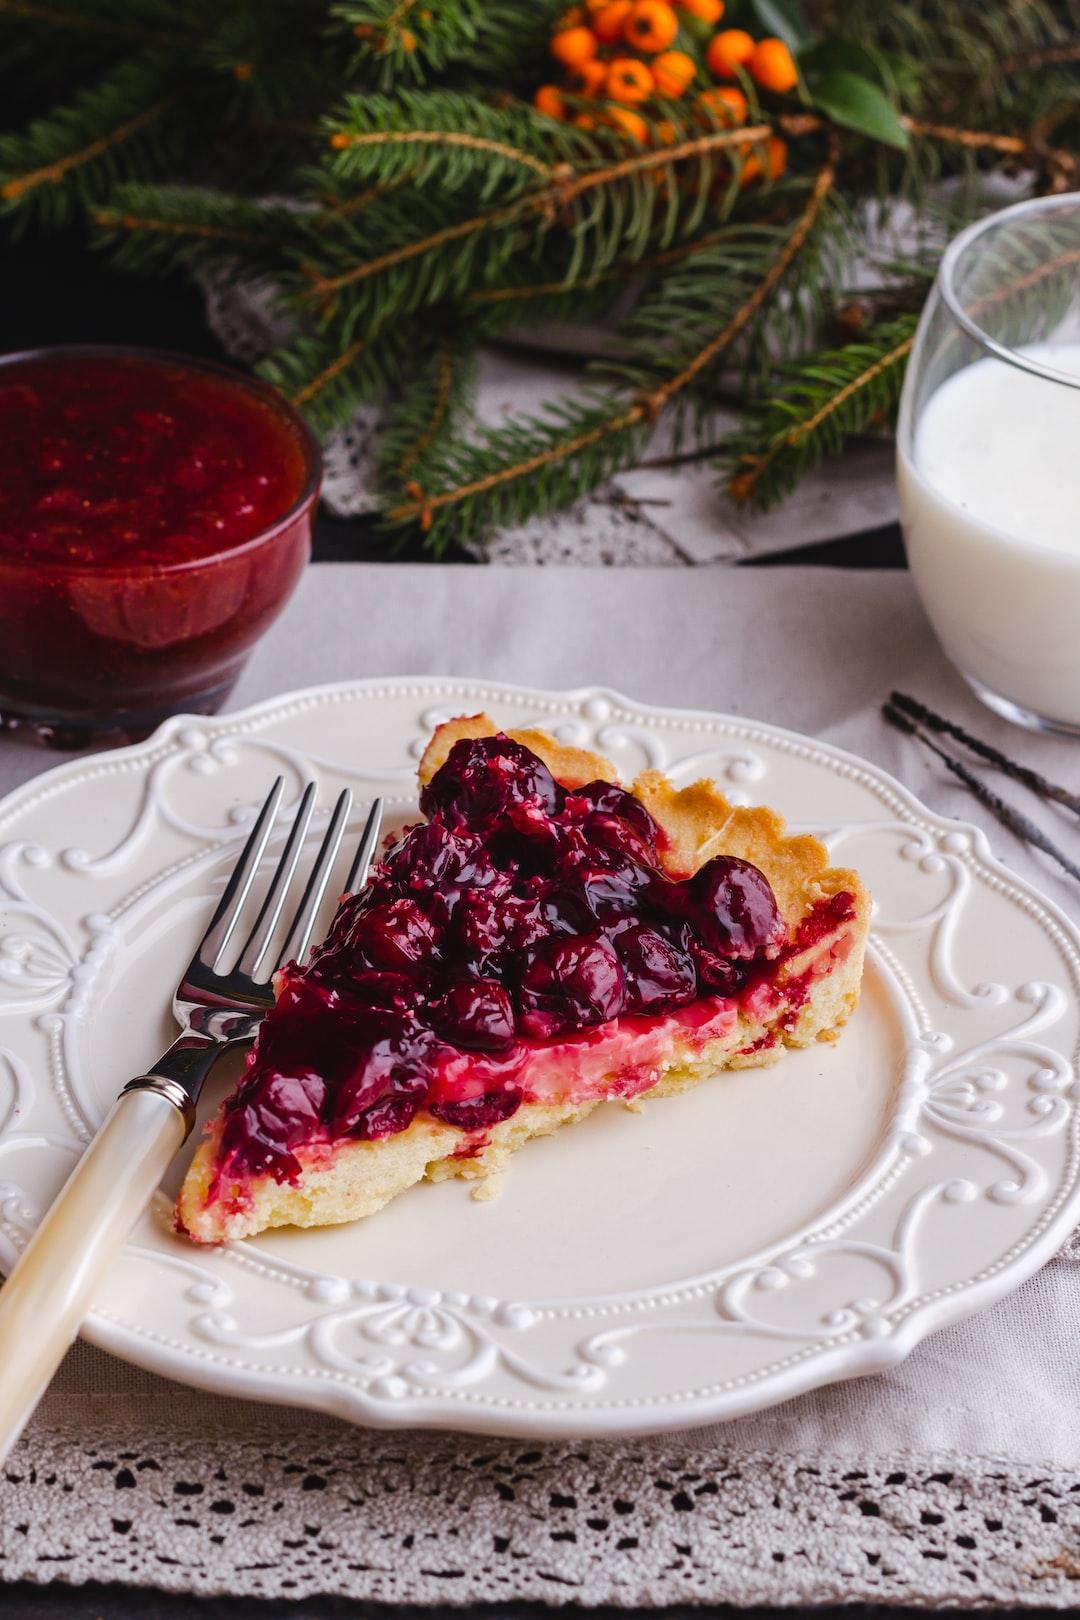 Slice of fruit pie